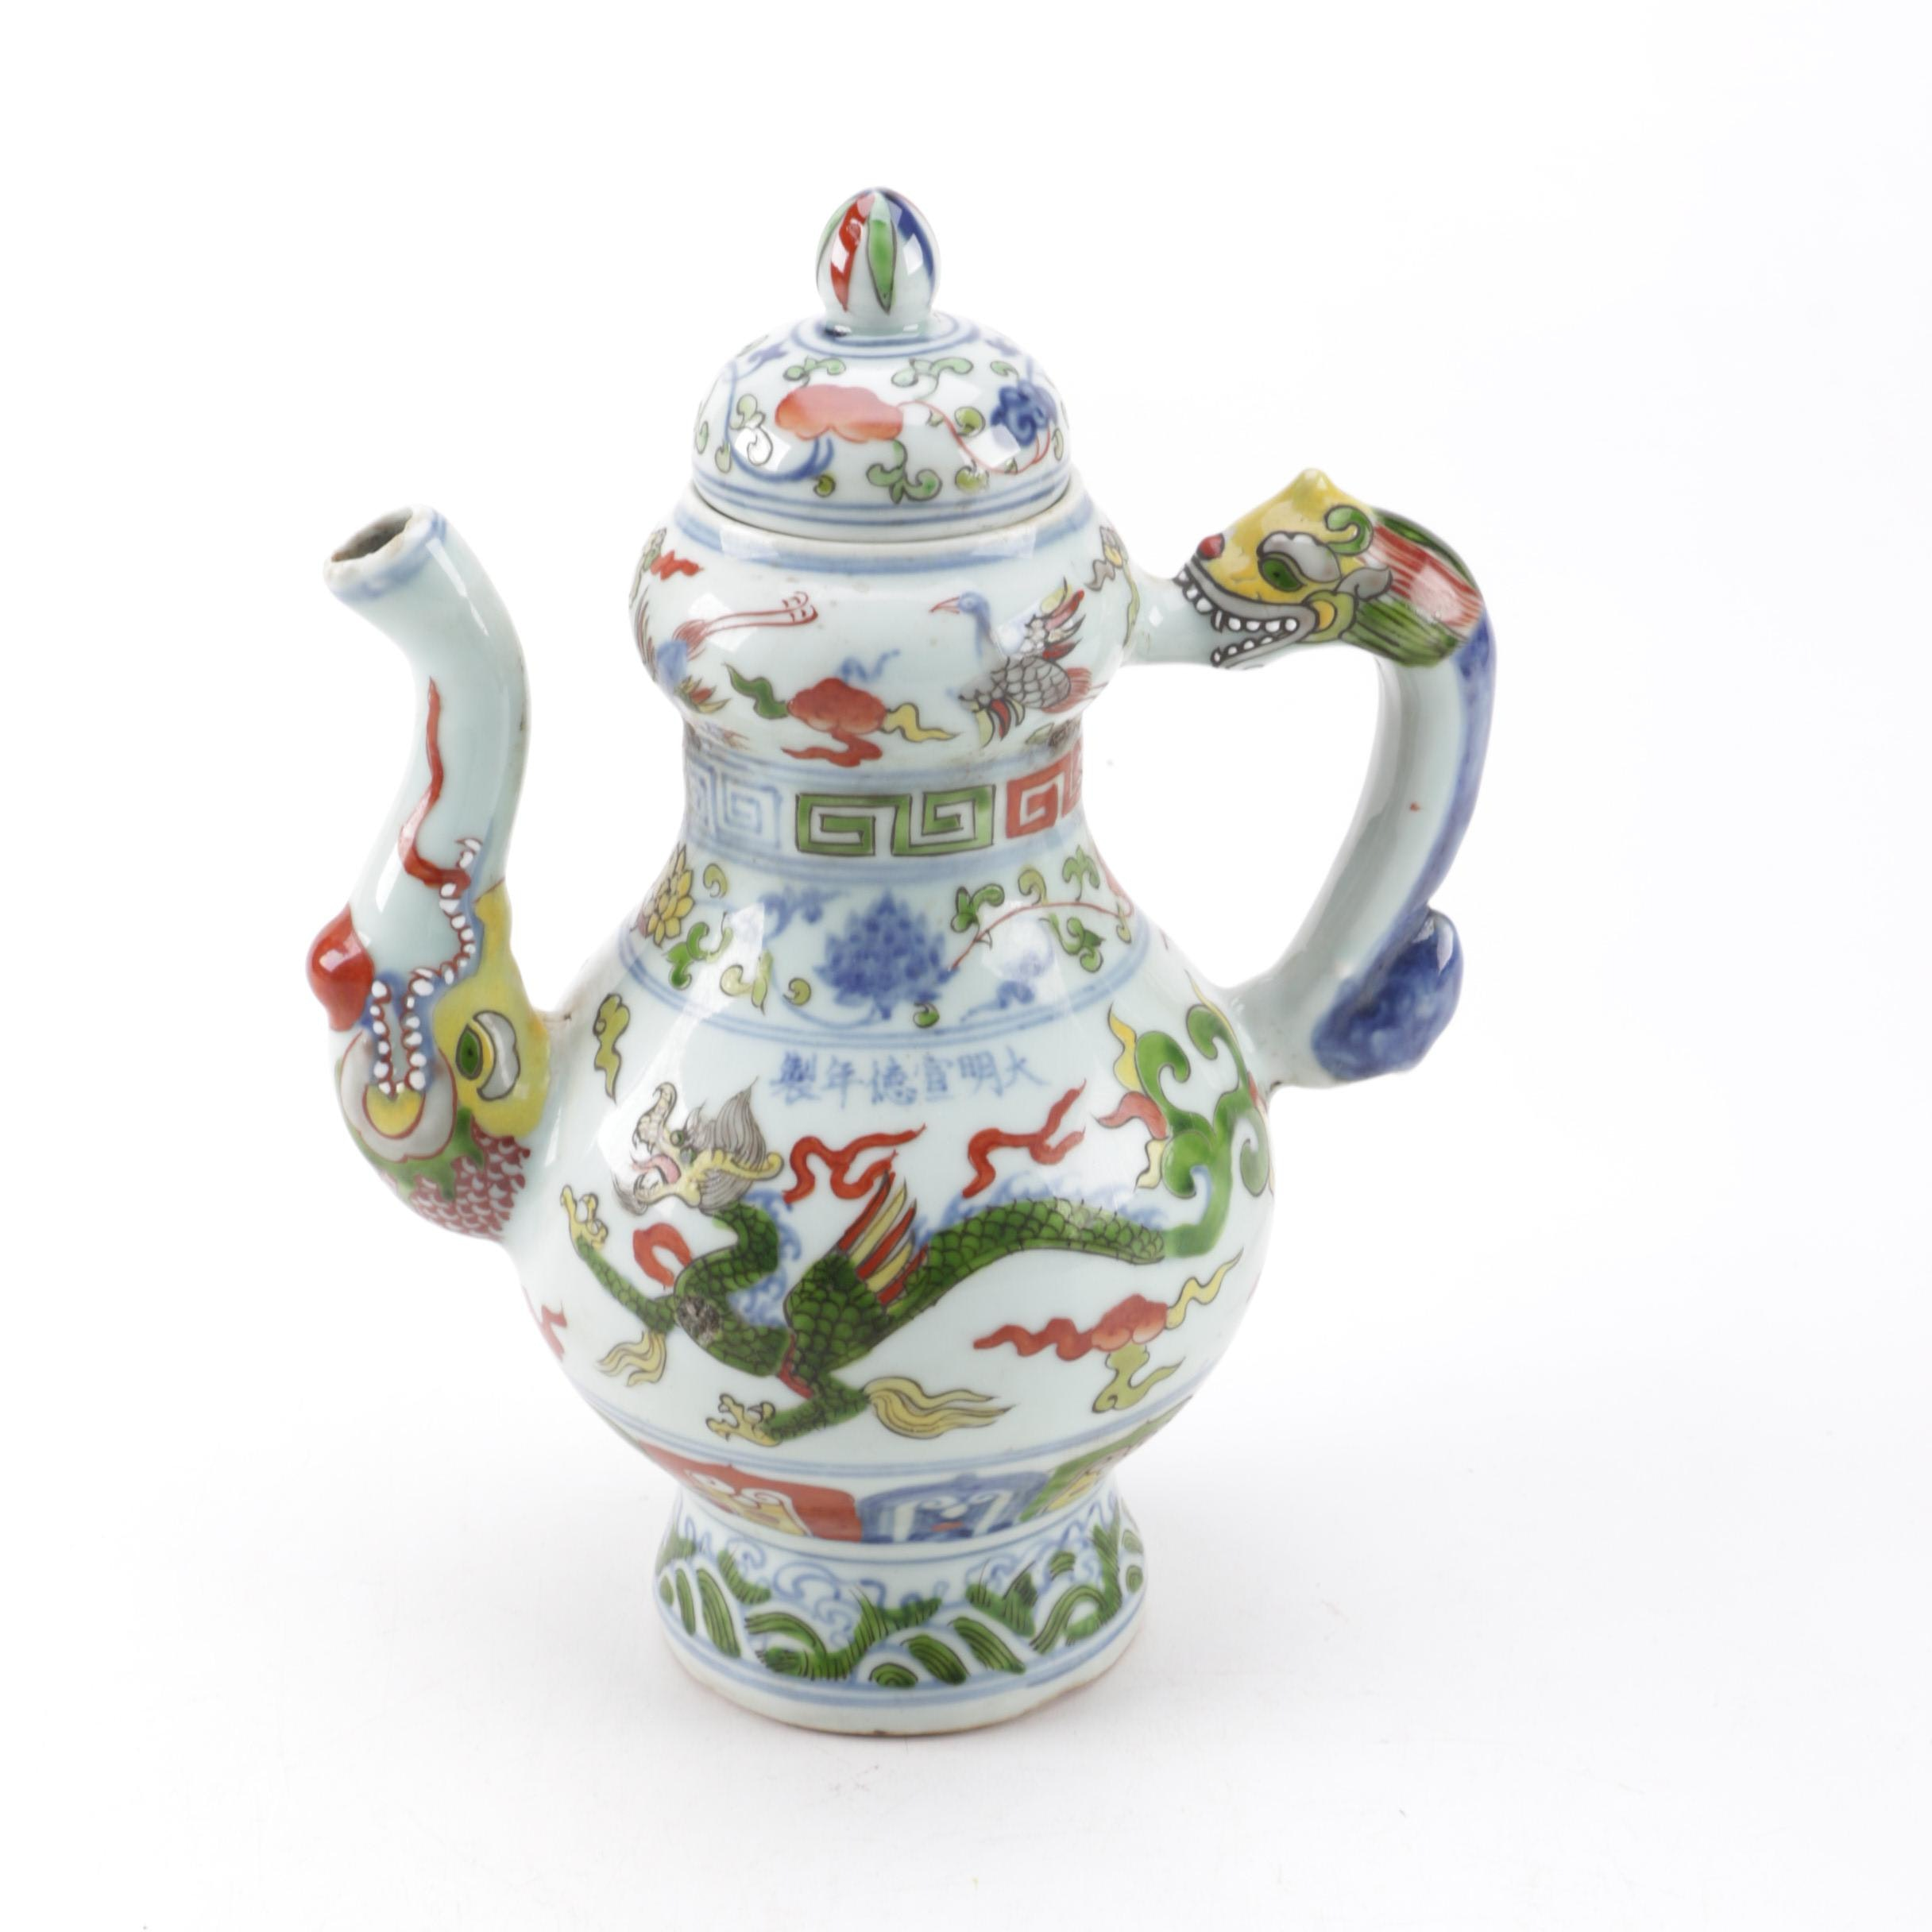 Chinese Porcelain Gourd Ewer